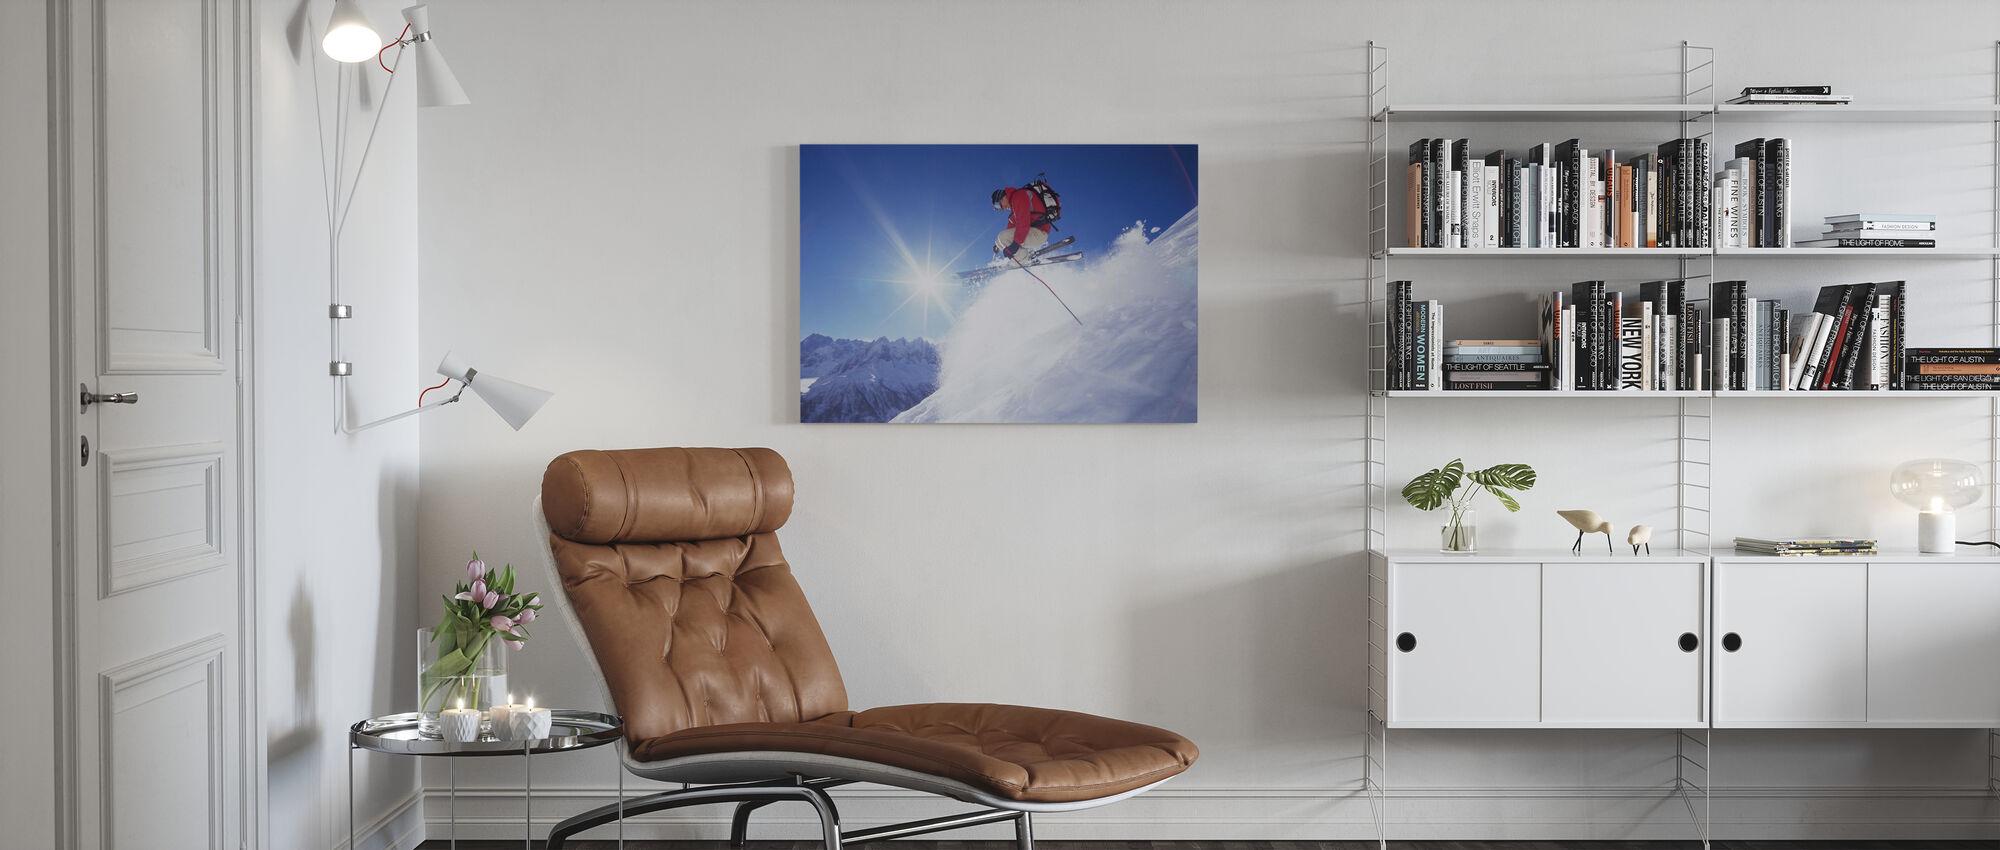 Adrenalin Ski - Lerretsbilde - Stue